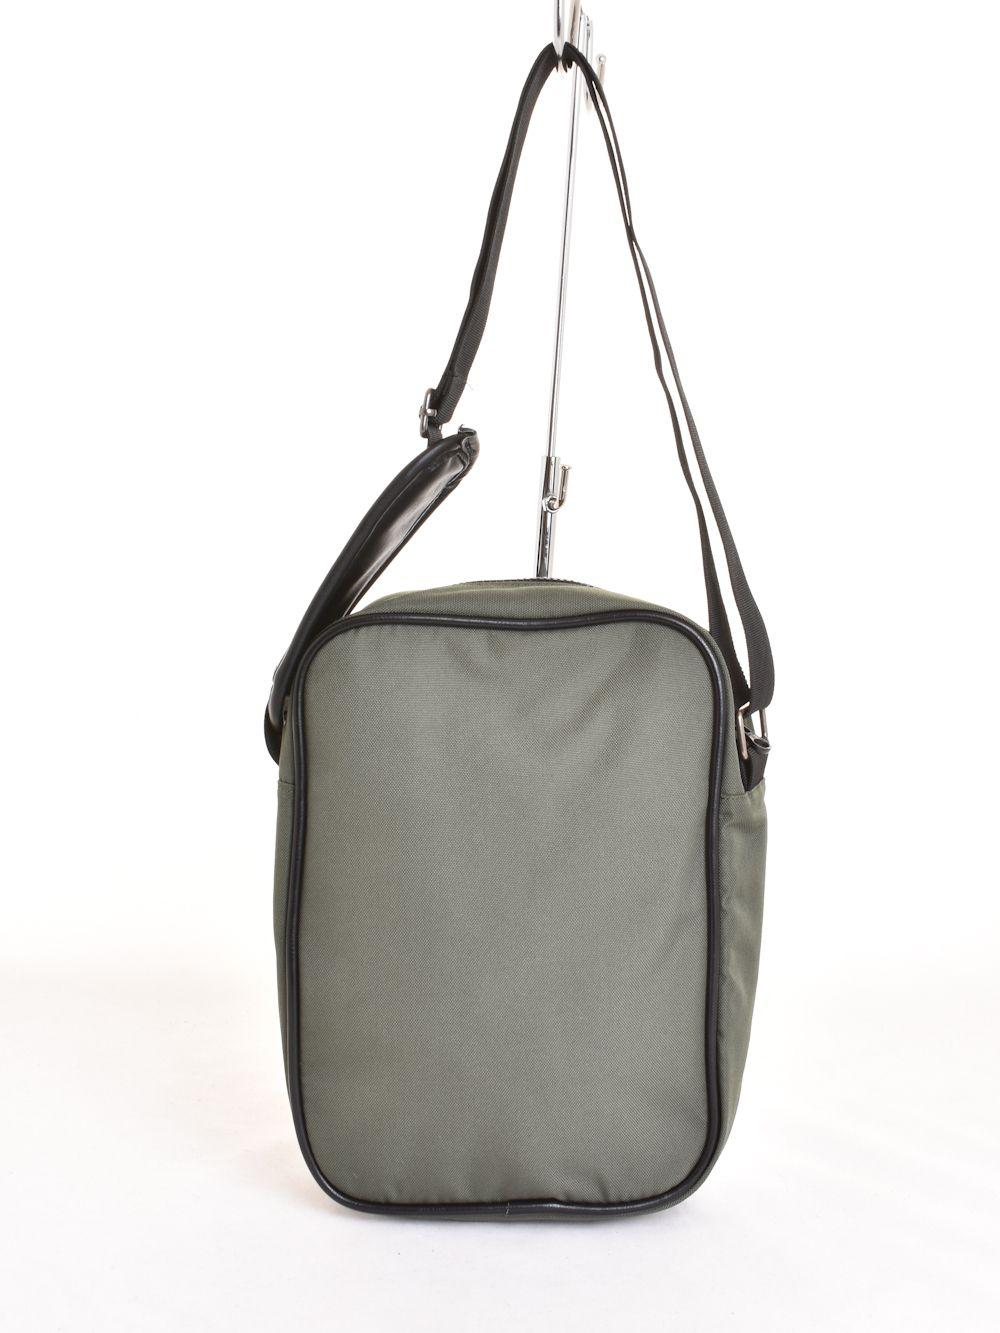 Devergo férfi táska · Devergo férfi táska · Devergo férfi táska ... 5dd9e04f21